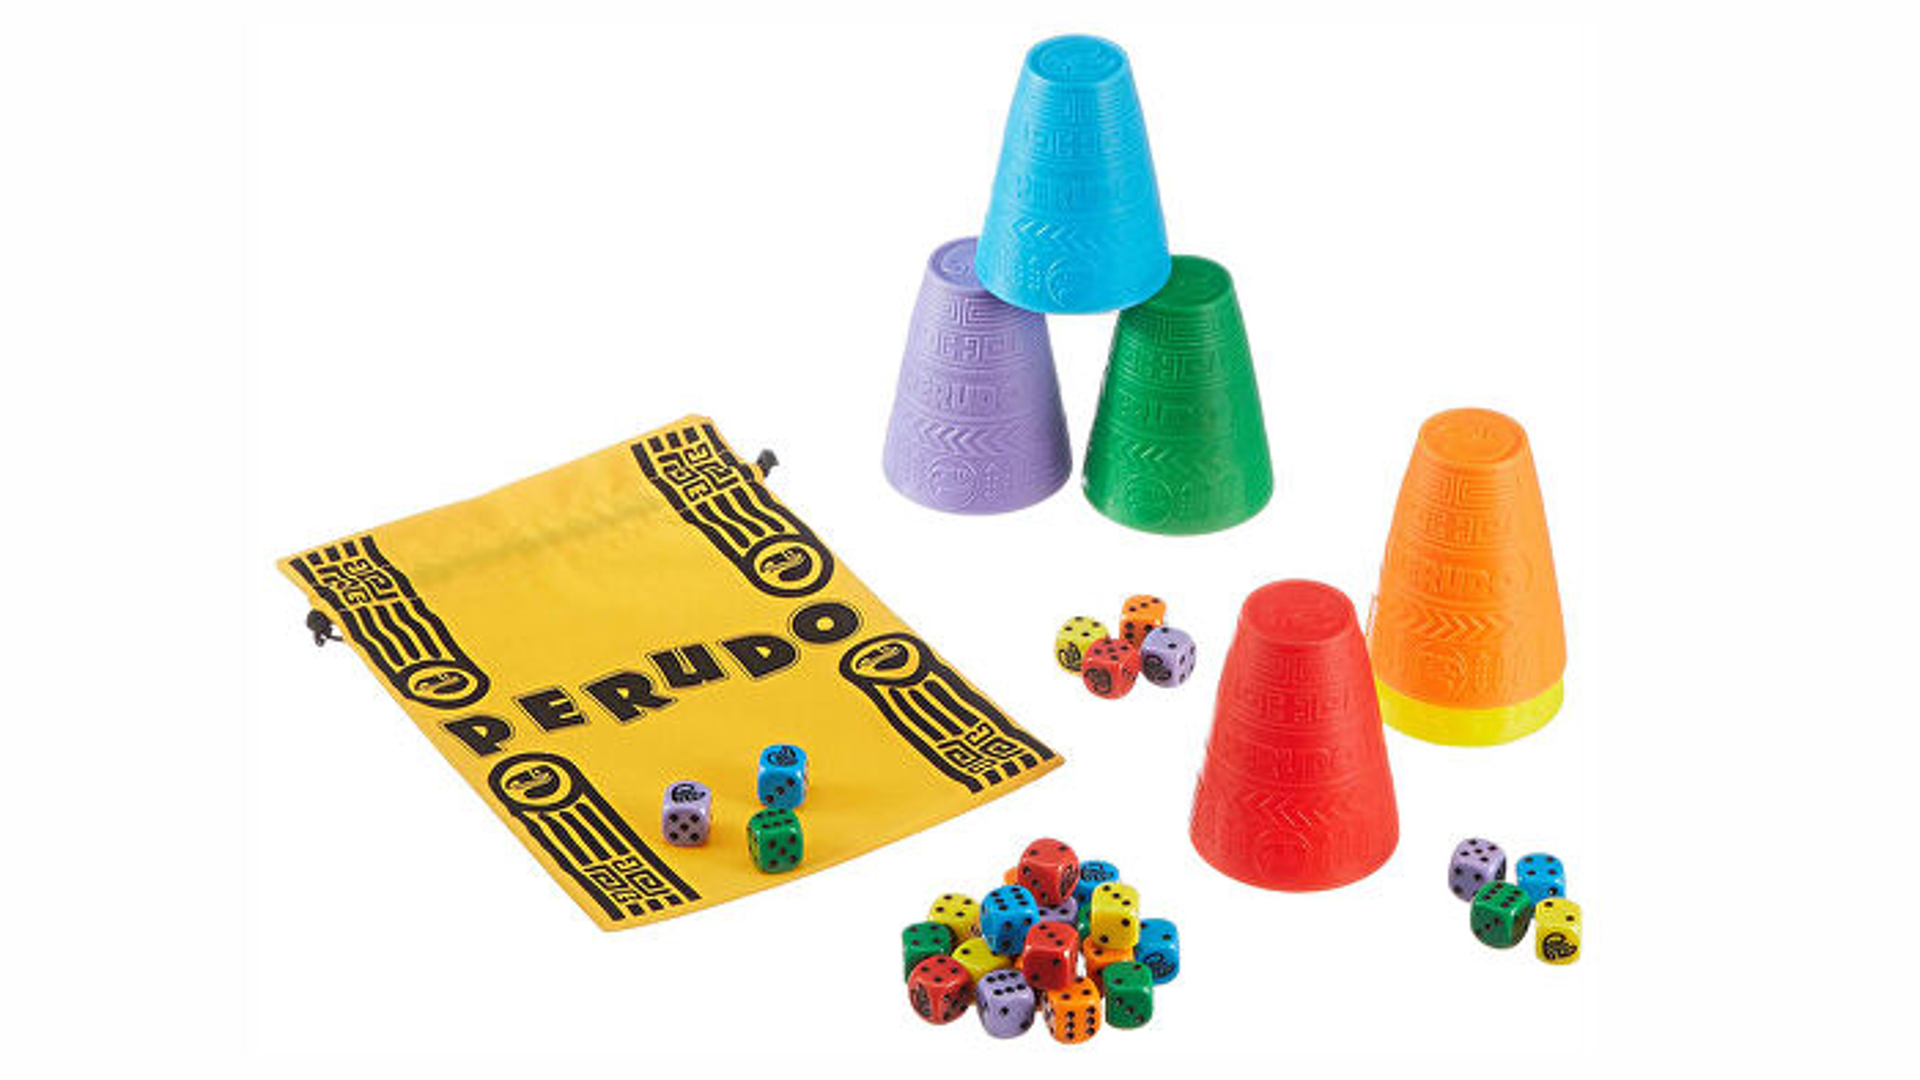 Perudo board game layout